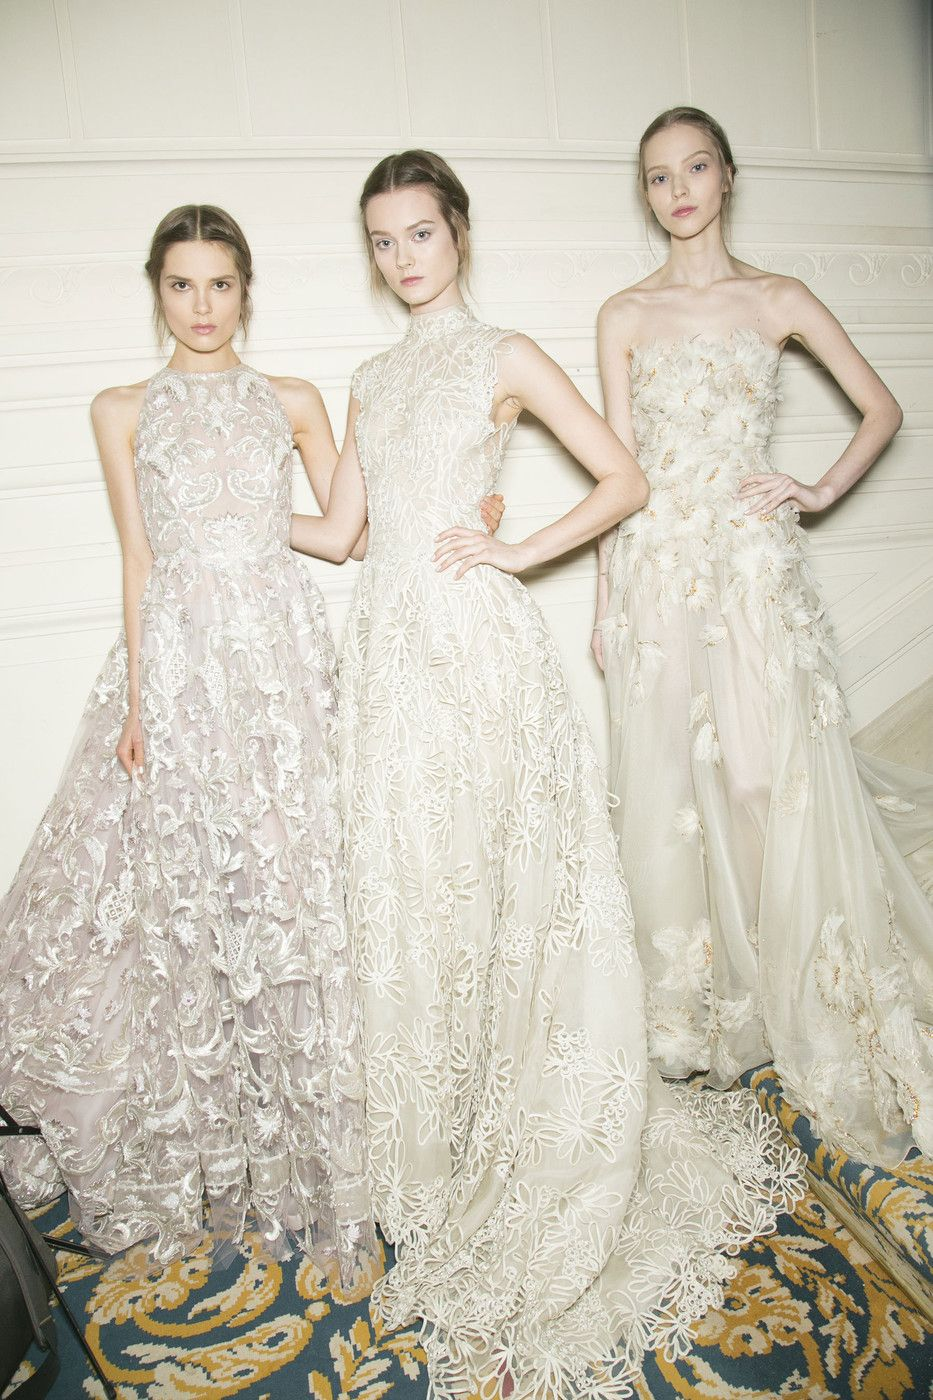 Valentino wedding dress  valentino weddingdress trouwjurk bruid bruidsjurk trouwen